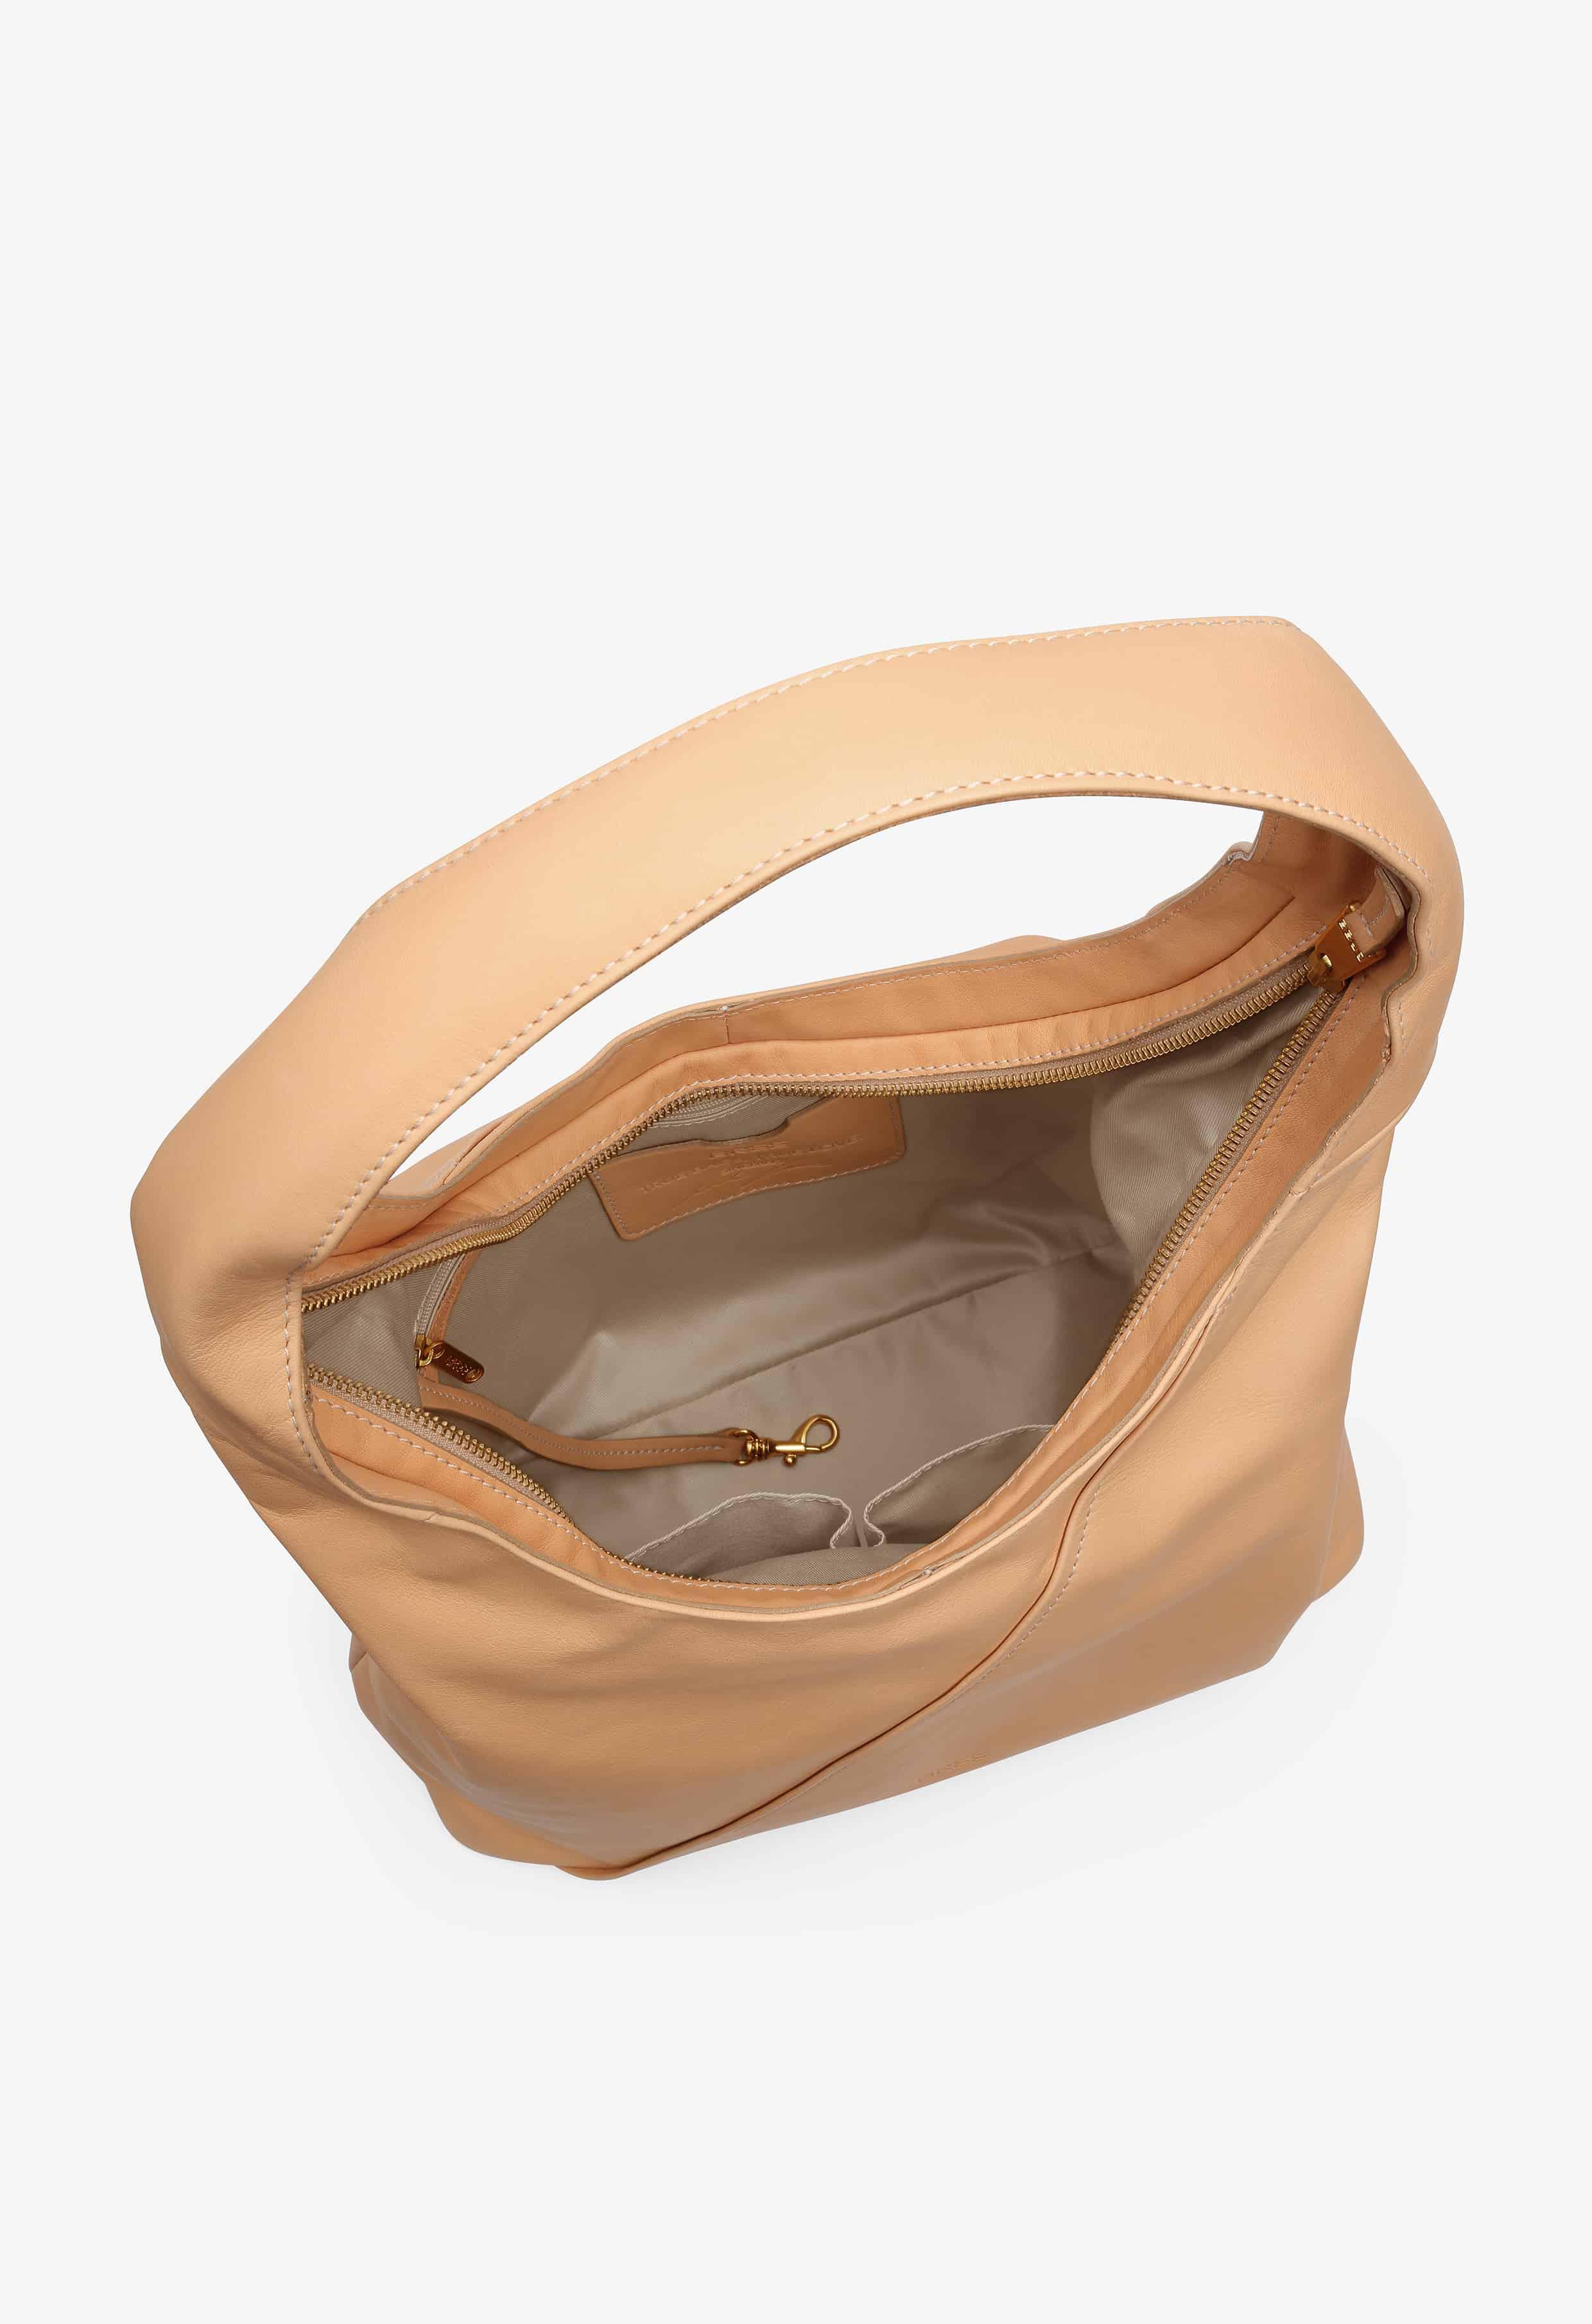 verschiedene Stile 60% Freigabe exquisiter Stil BREE Stockholm 48 Shopper Leder